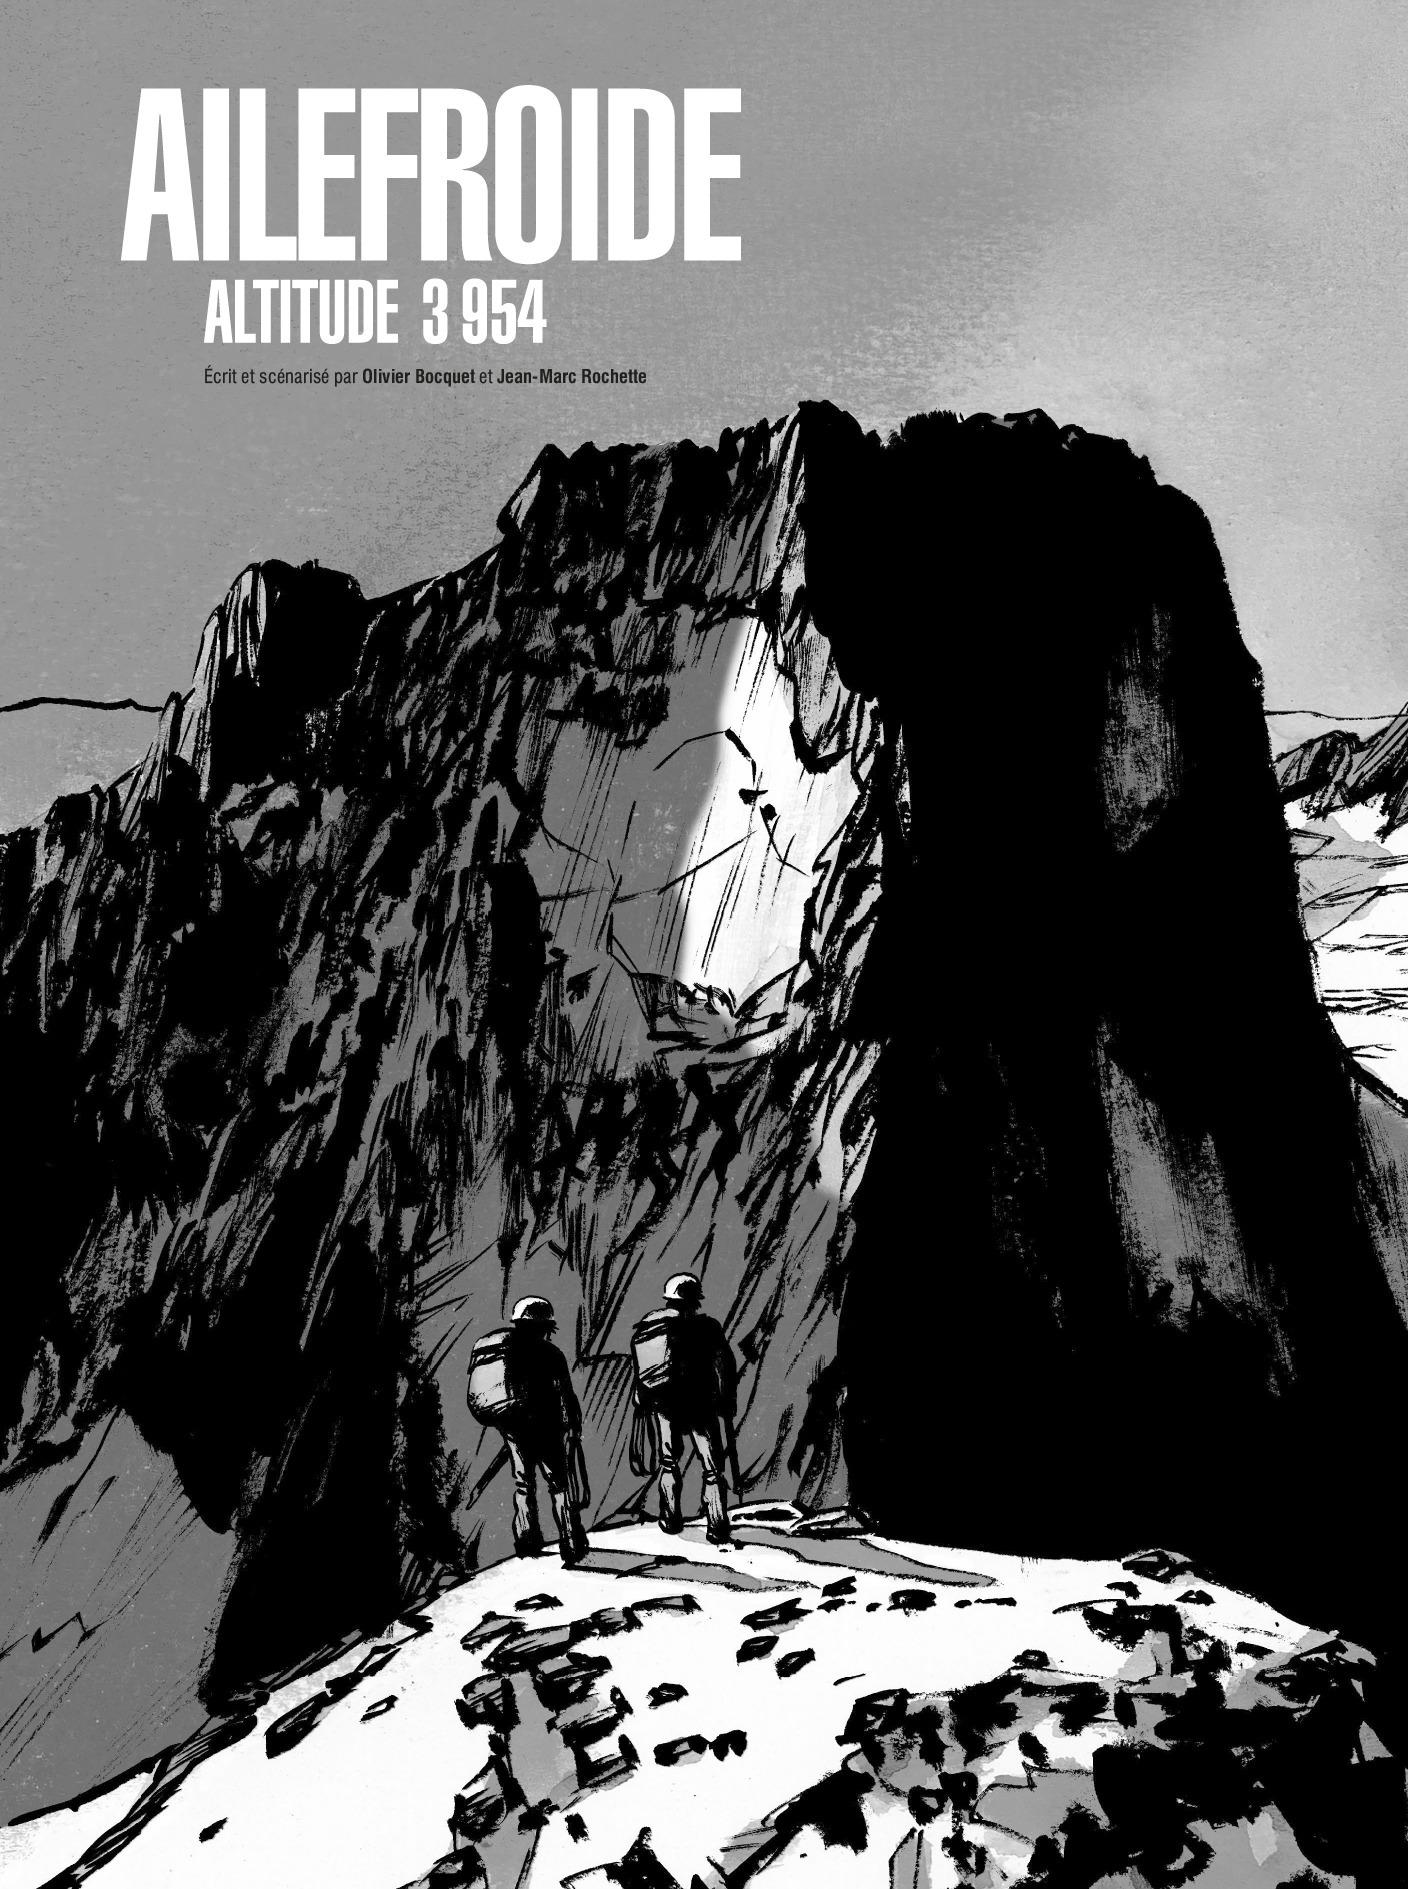 ALTITUDE 3954